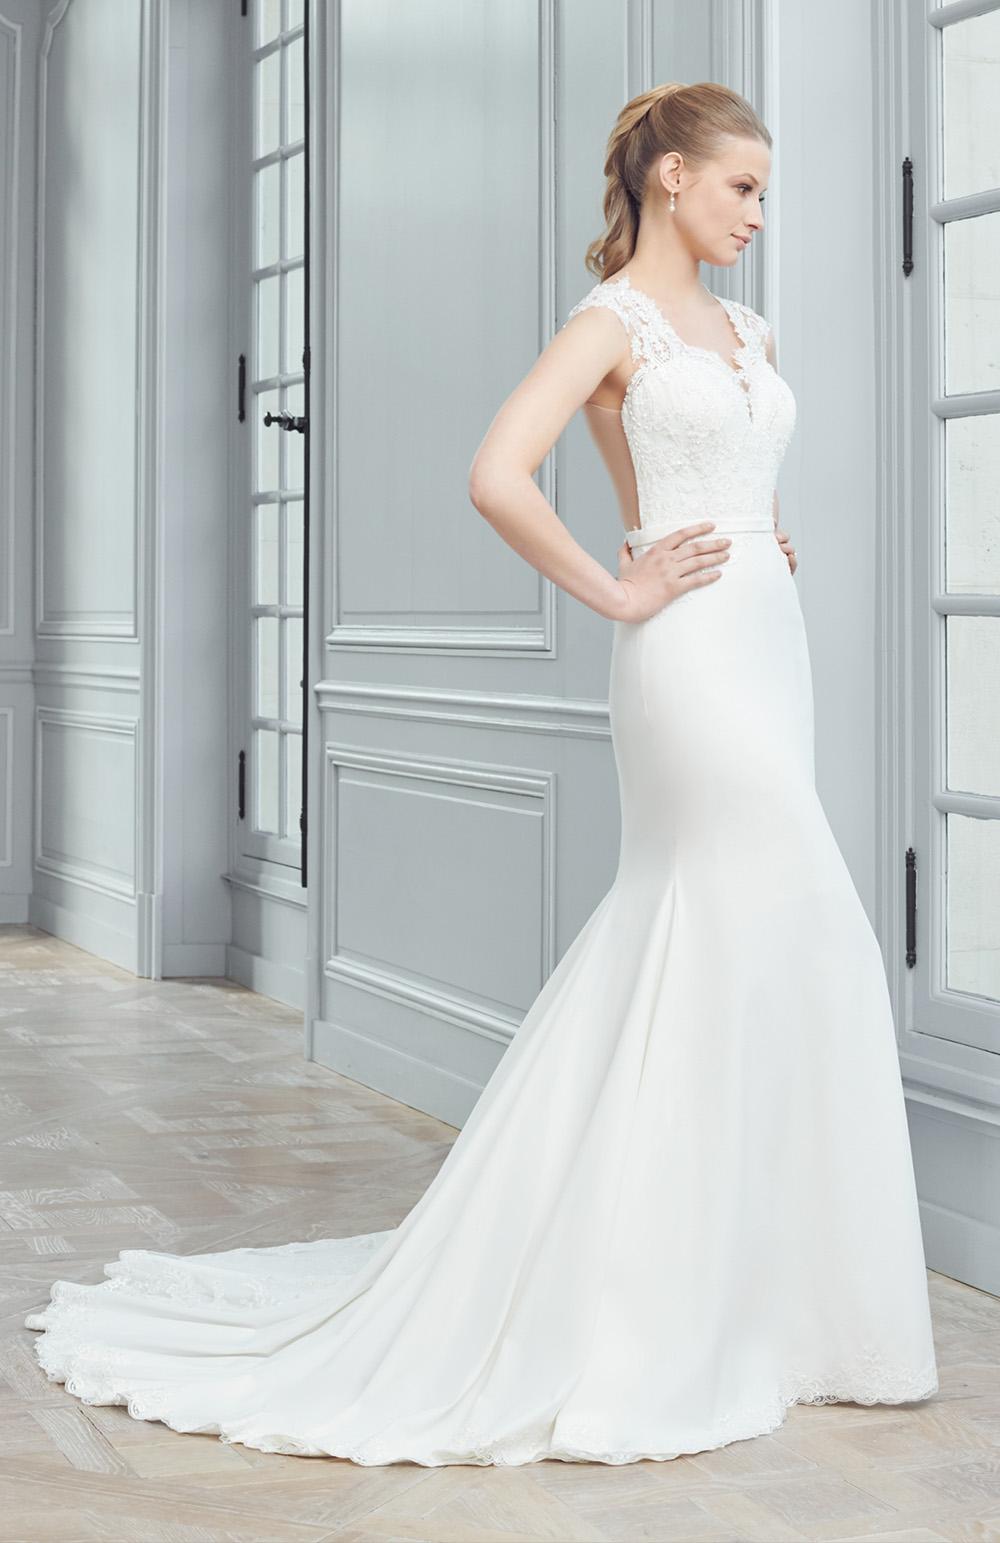 Robe de mariée Modèle Alva